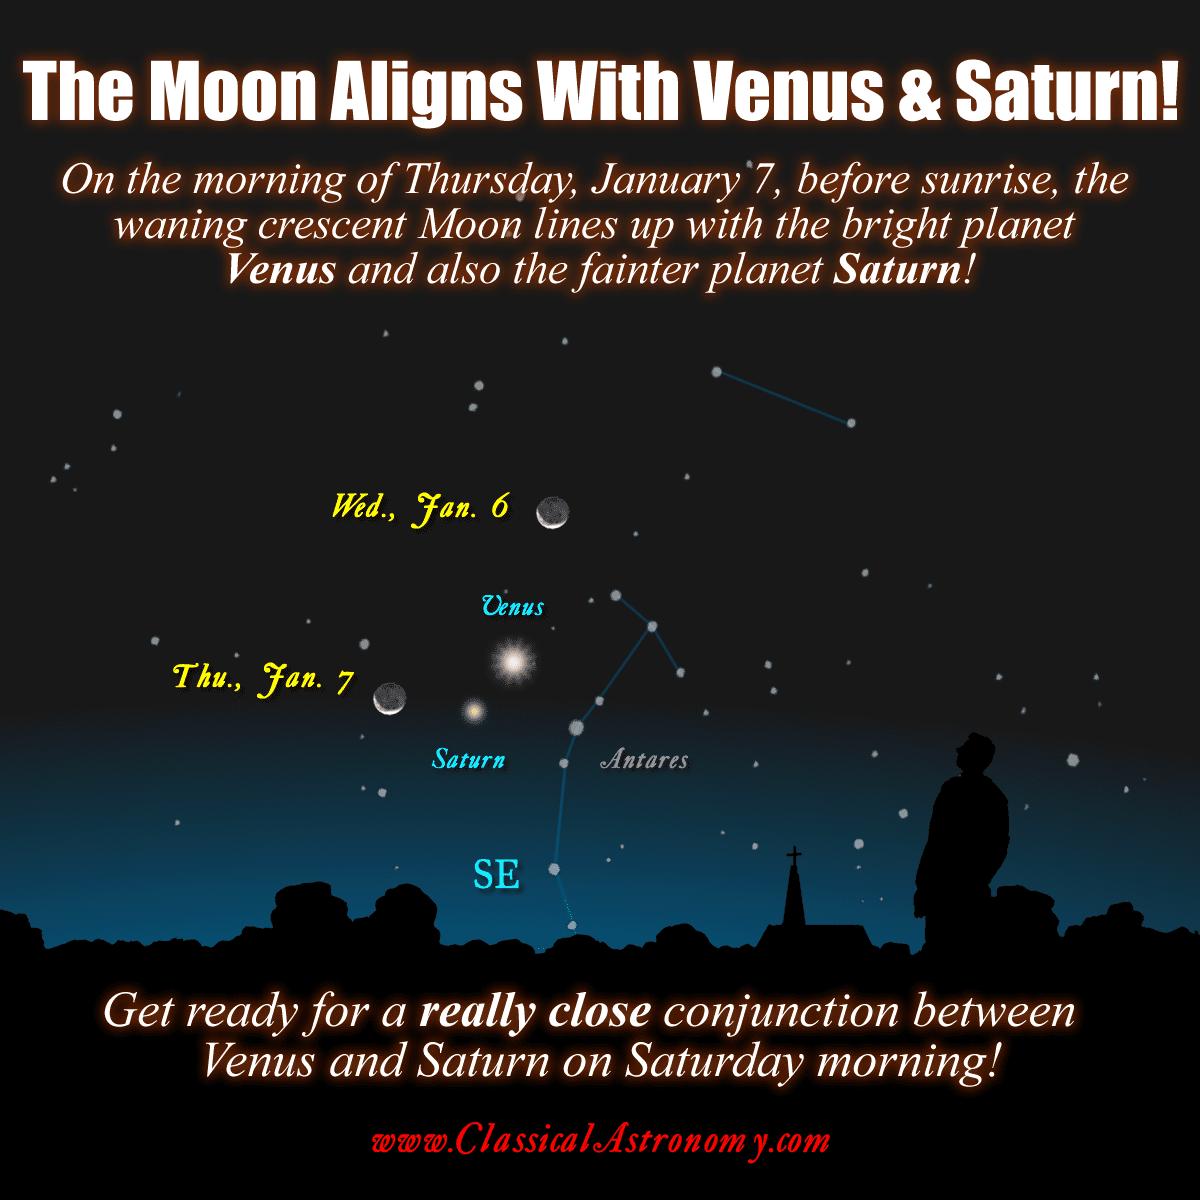 2016-1-LunarConj-VenusSaturn